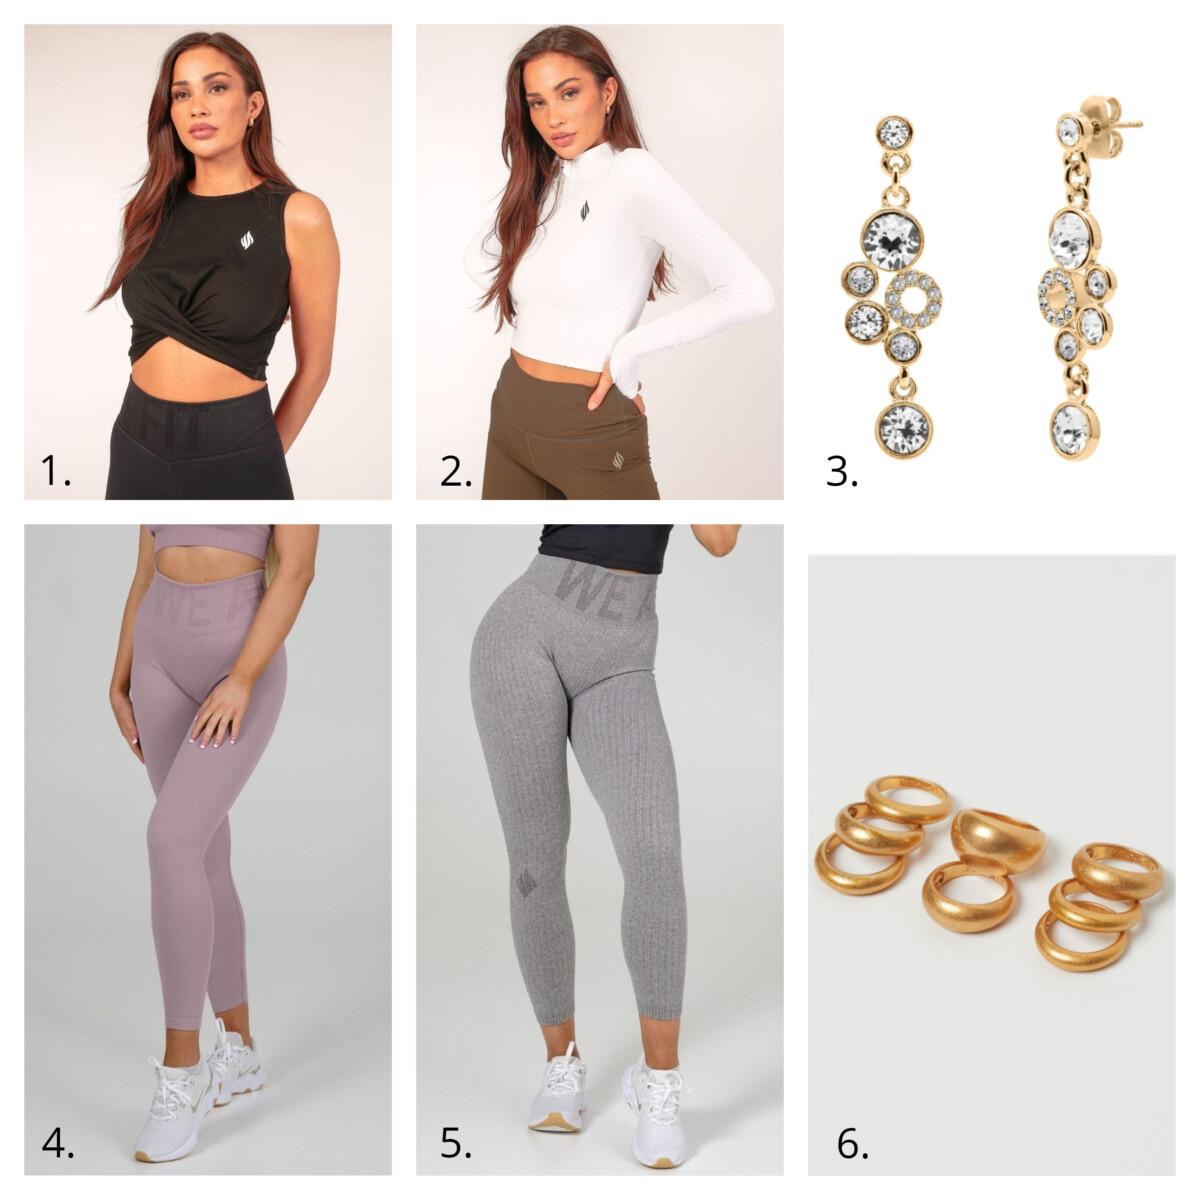 hm-wearefit-innkjøp-wants-isalicious-isalicious1-mote-trend-stil-fashion-style-outfit-antrekk-klær-isalicious.blogg.no-dagensantrekk-vilha-